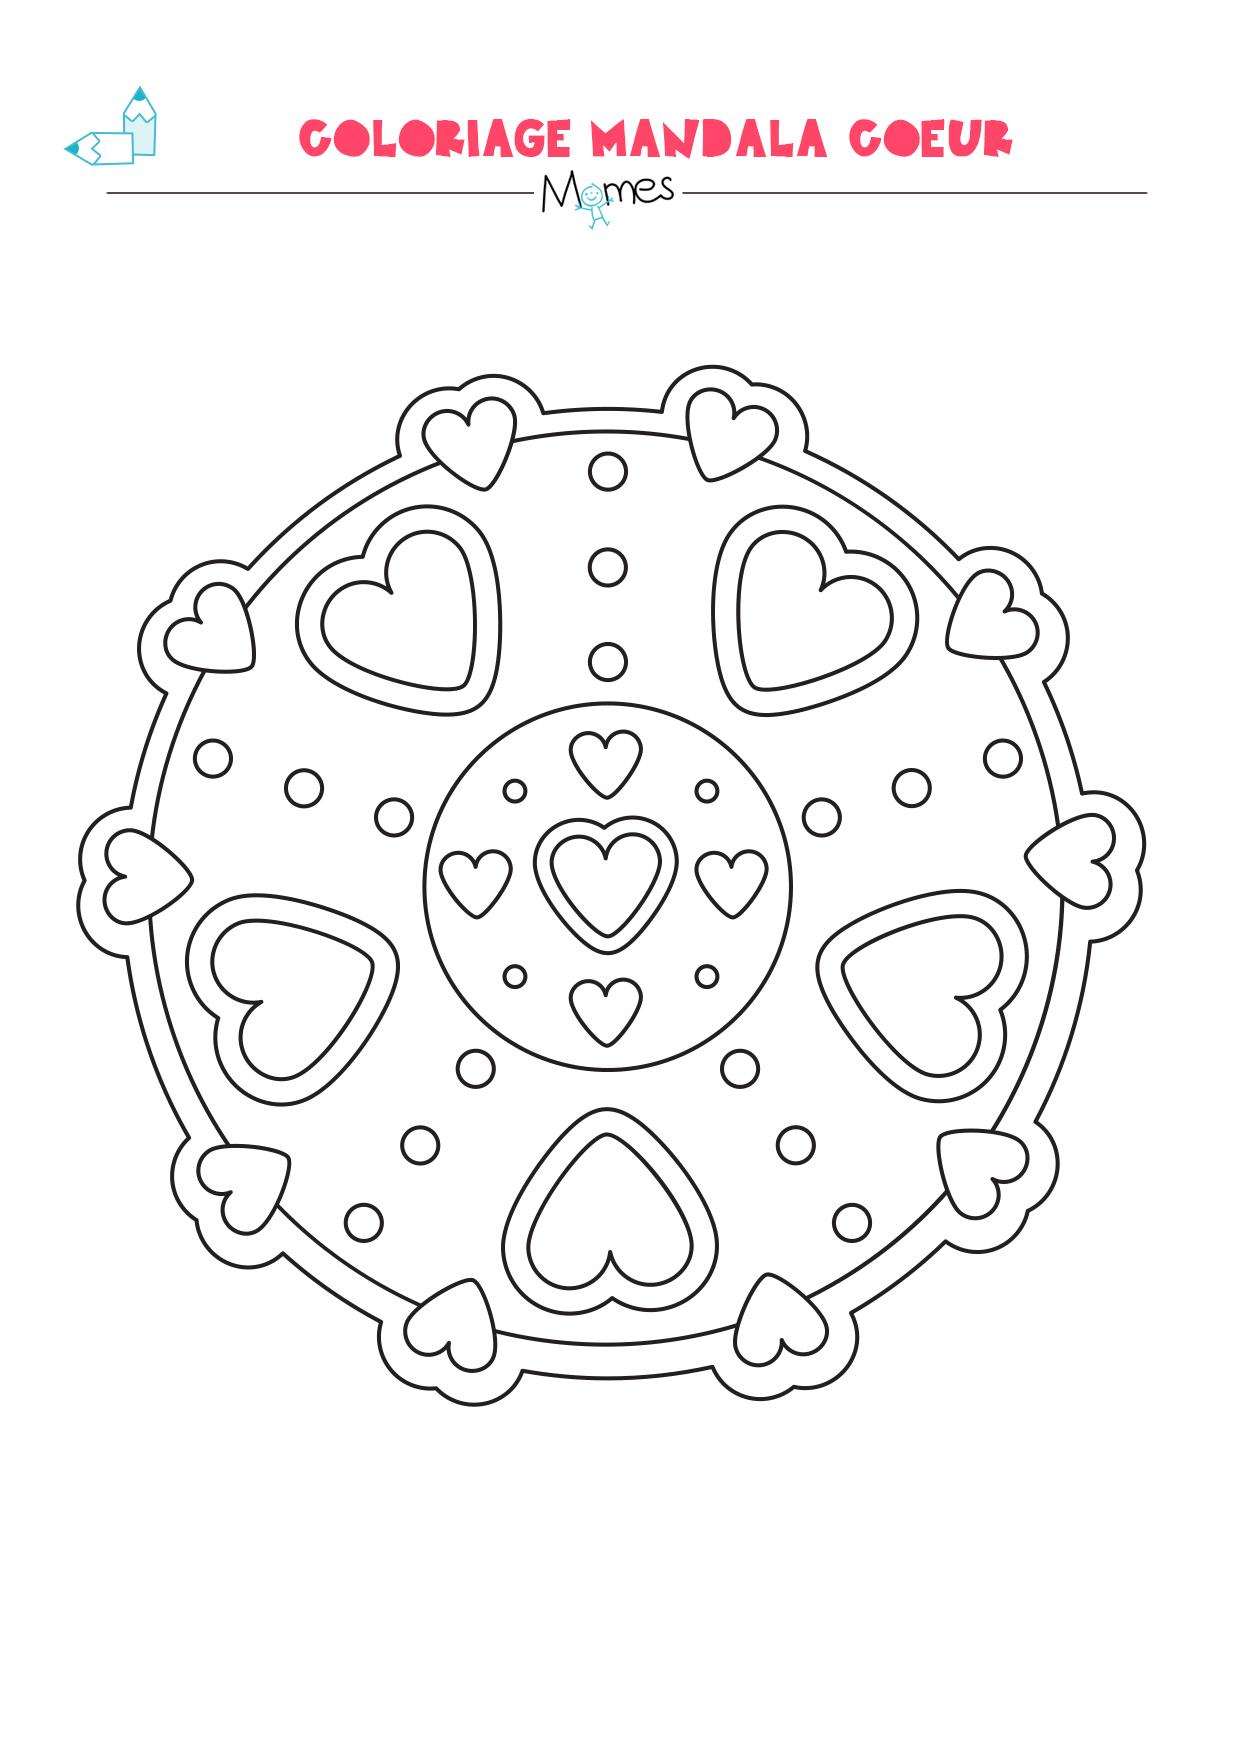 Mandala coeur colorier facile - Coloriage de coeurs ...